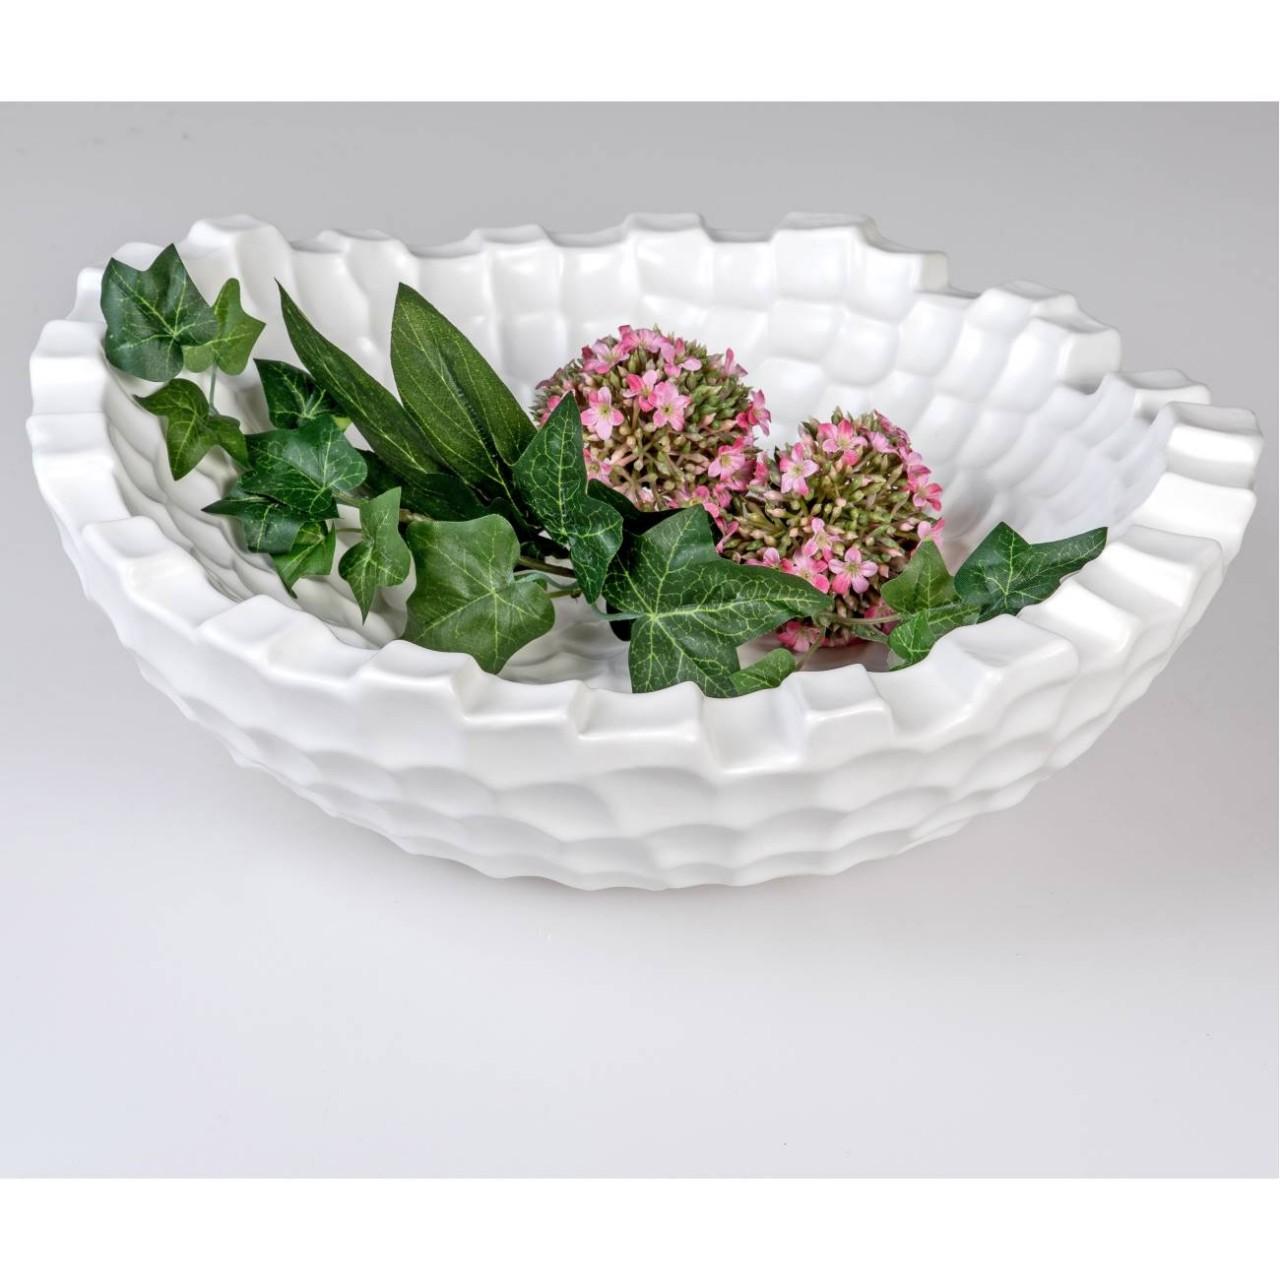 Teller BLATT L Dekoschale 26cm weiß glänzend Keramik länglich Formano